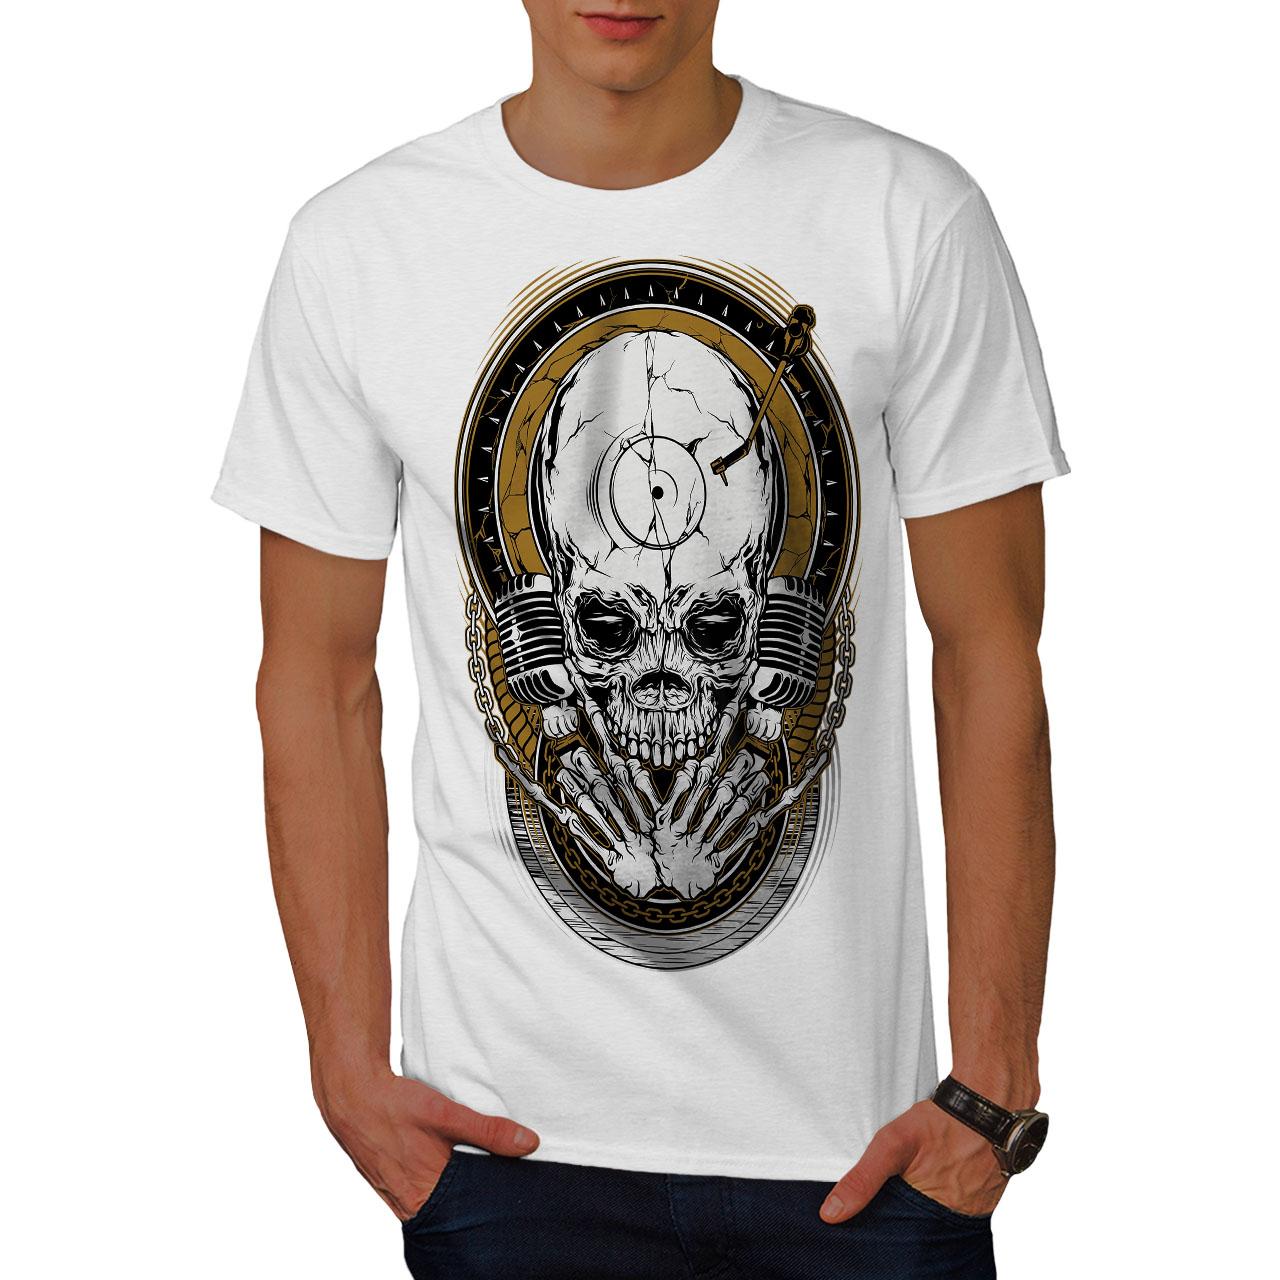 Wellcoda Death Rock Music Skull Mens T-shirt Graphic Design Printed Tee